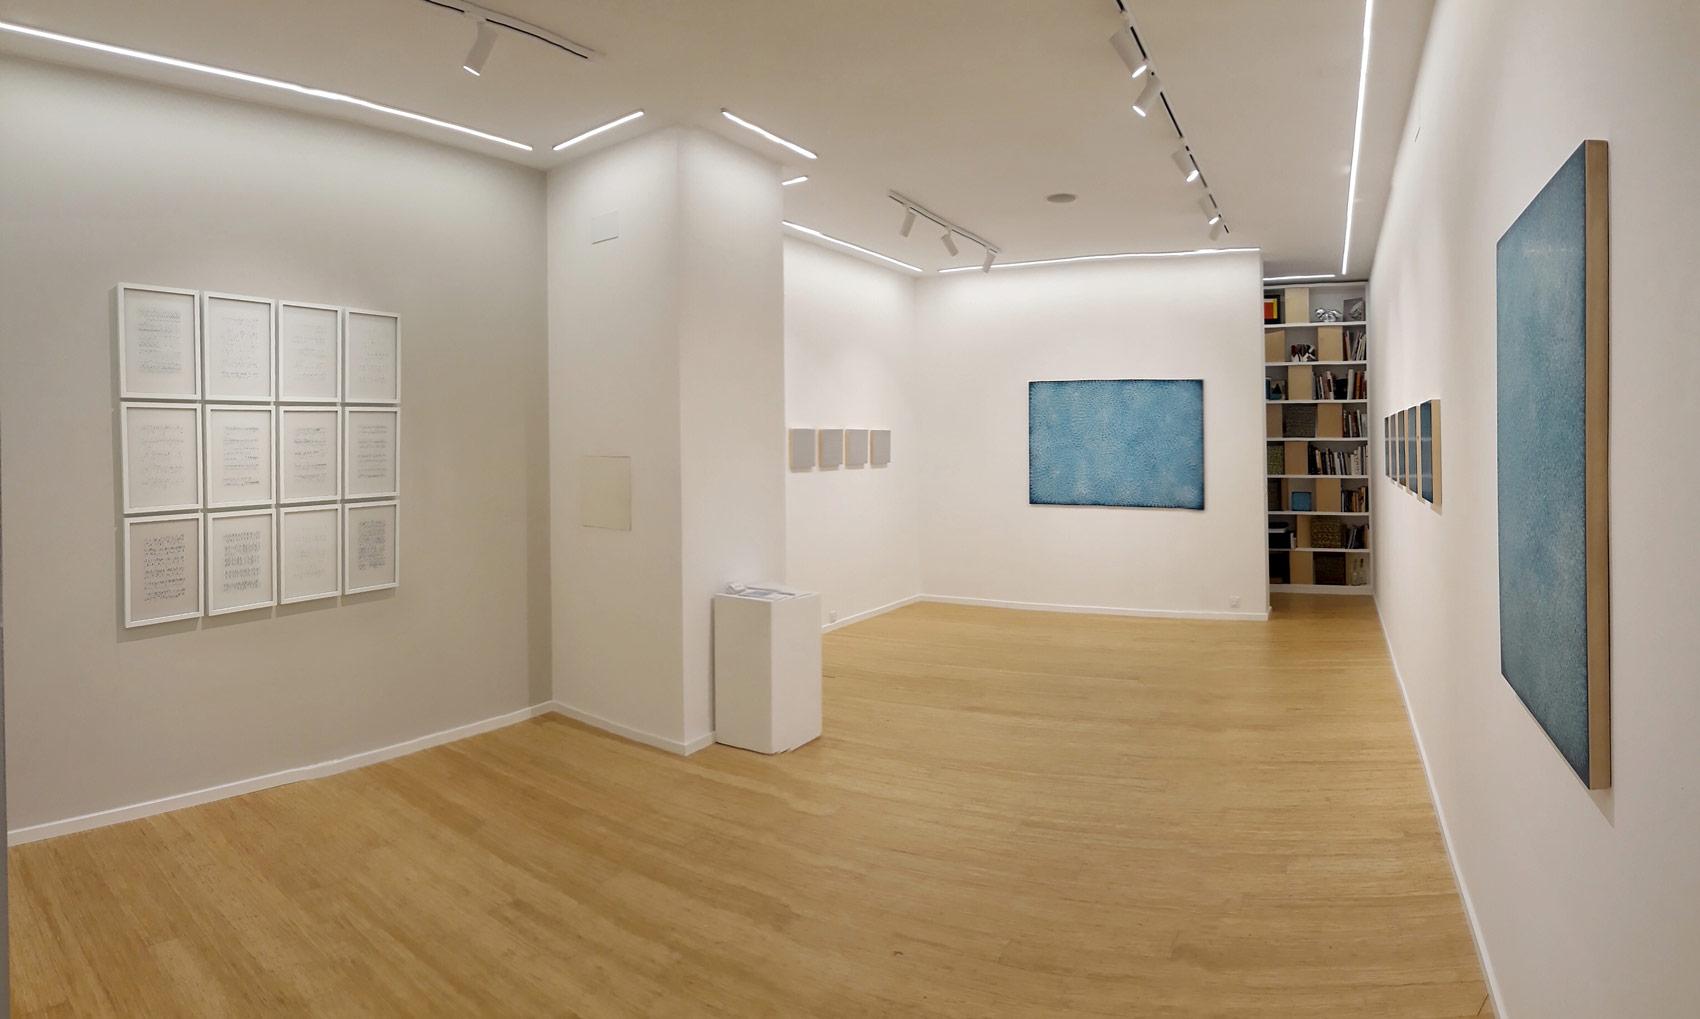 asociacion-galerias-arte-contemporanea-galicia-galeria-metro-1